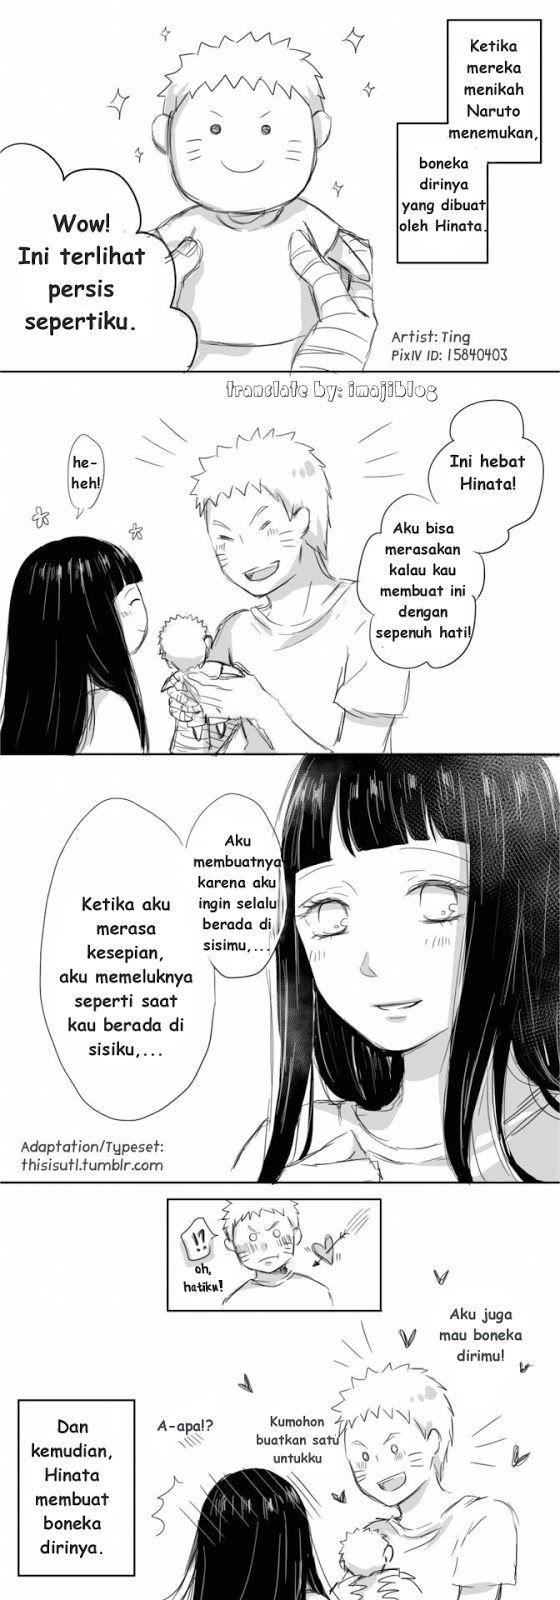 Komik NaruHina | Boneka Hinata | Bahasa Indonesia (1)